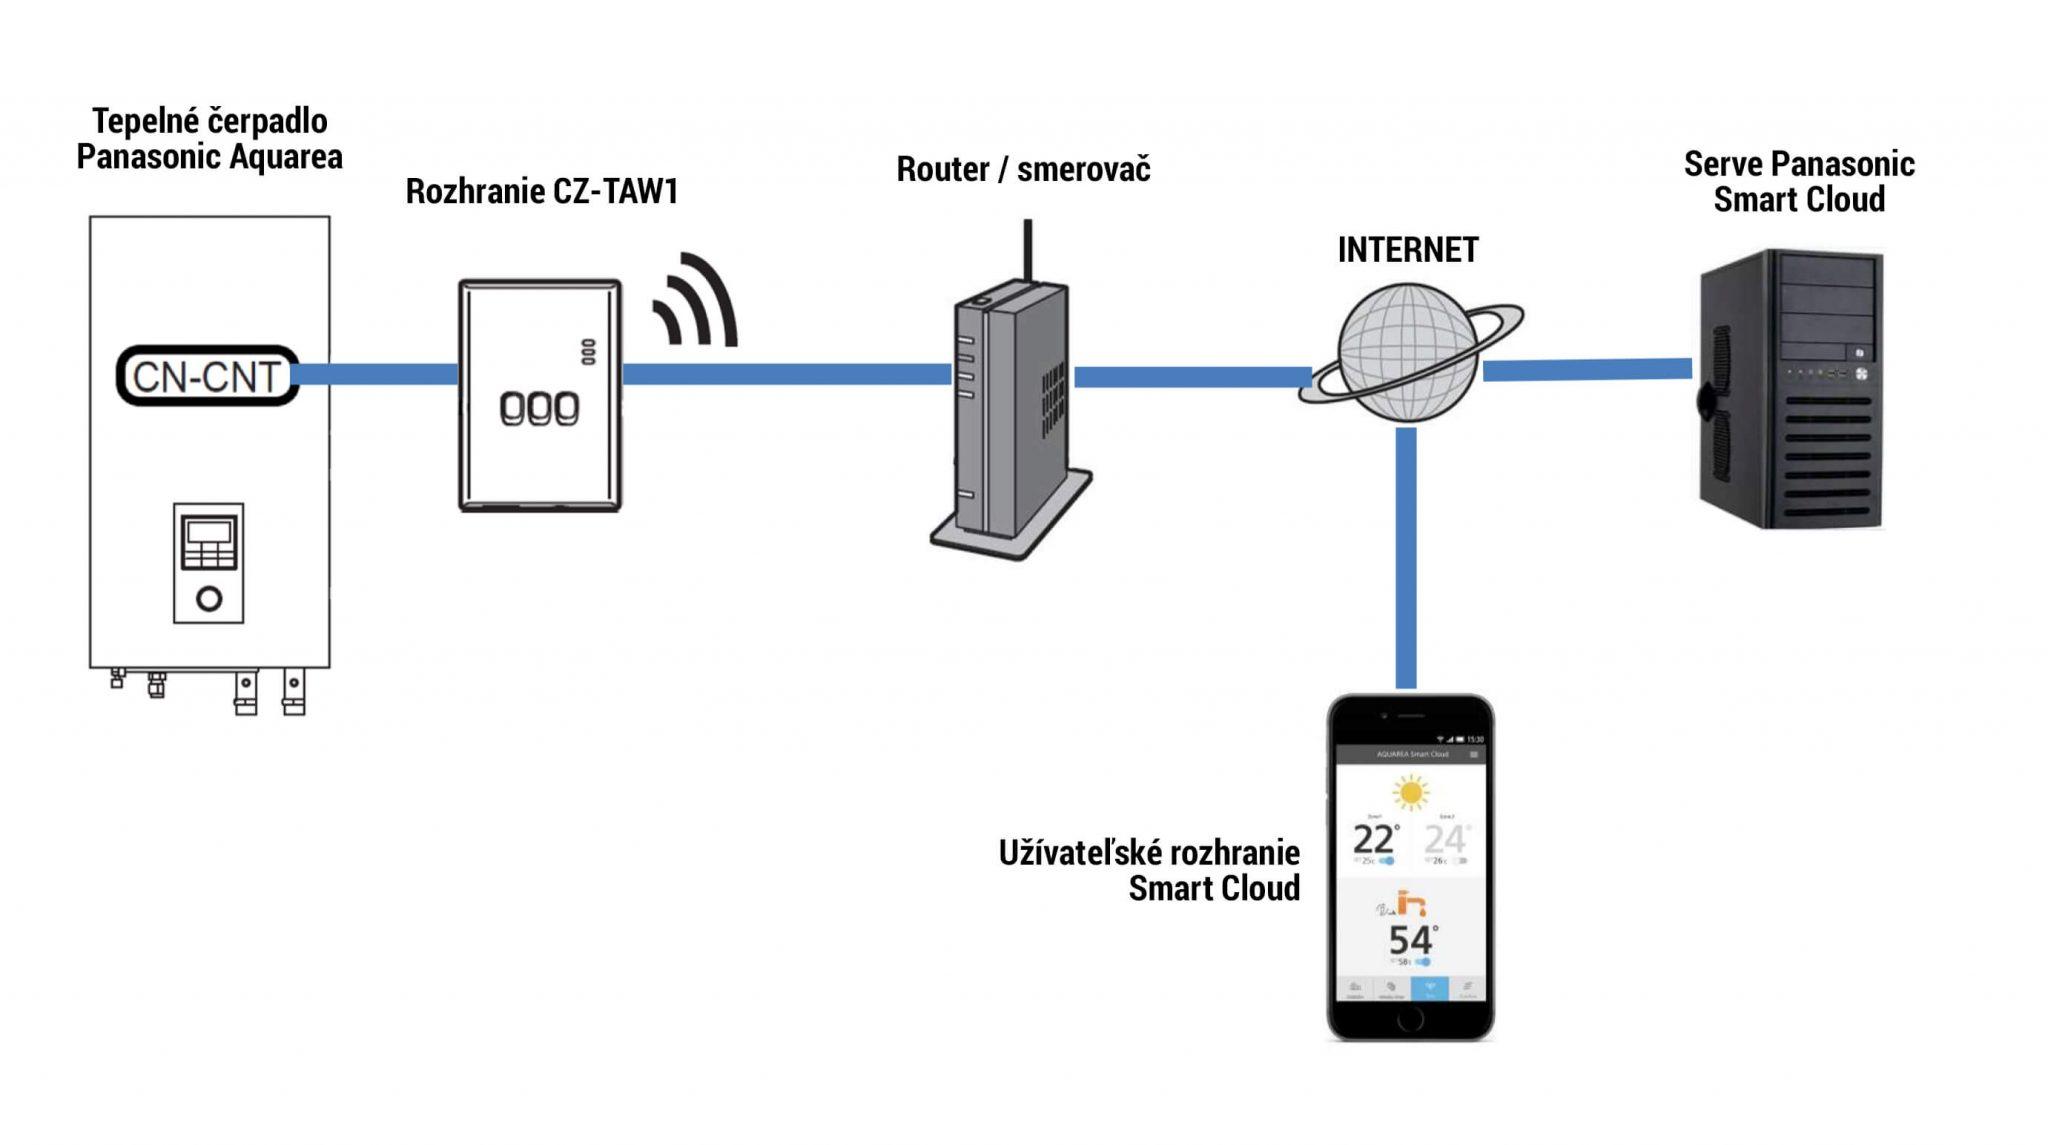 Panasonic Aquarea Smart Cloud